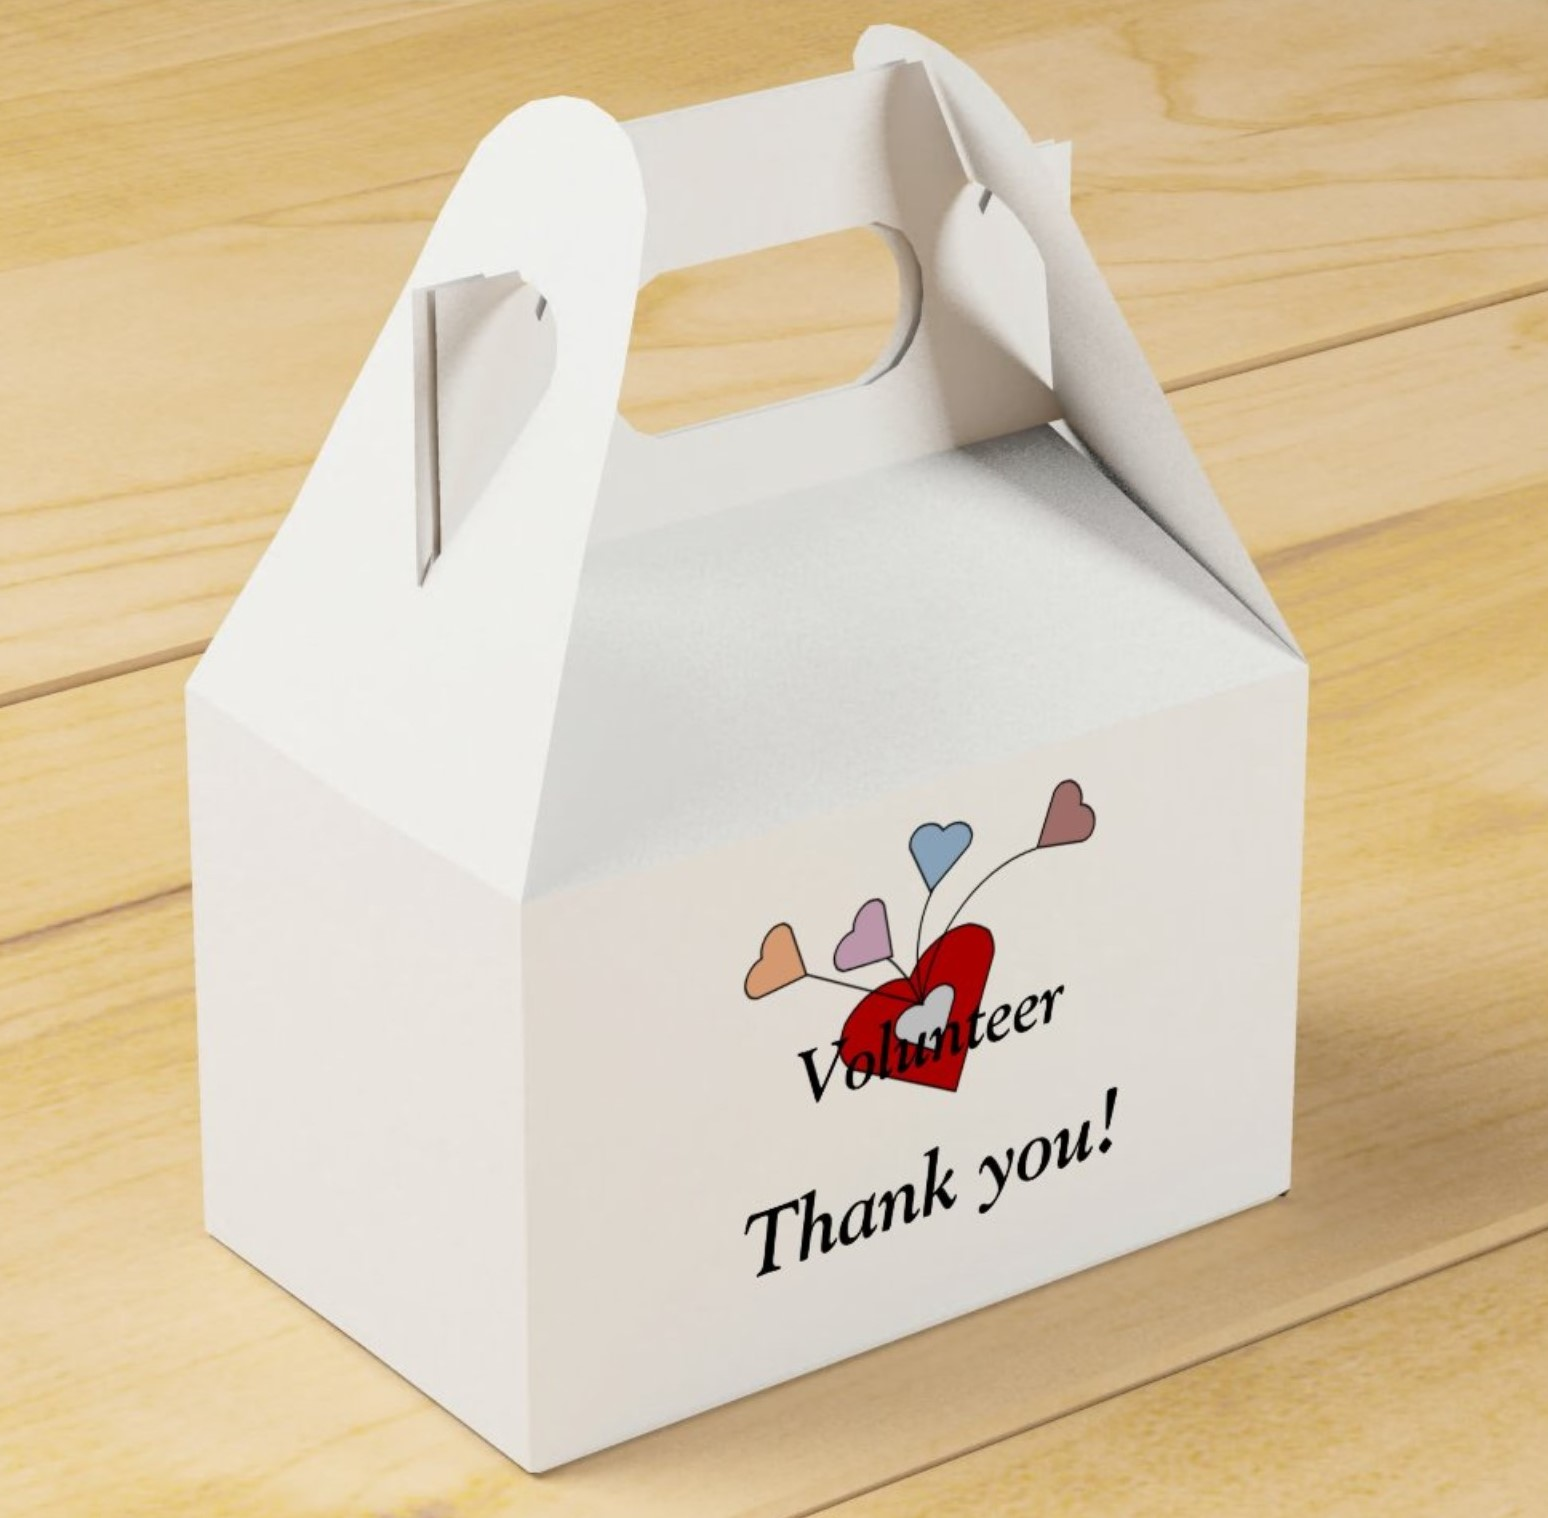 Volunteer Thank You Box